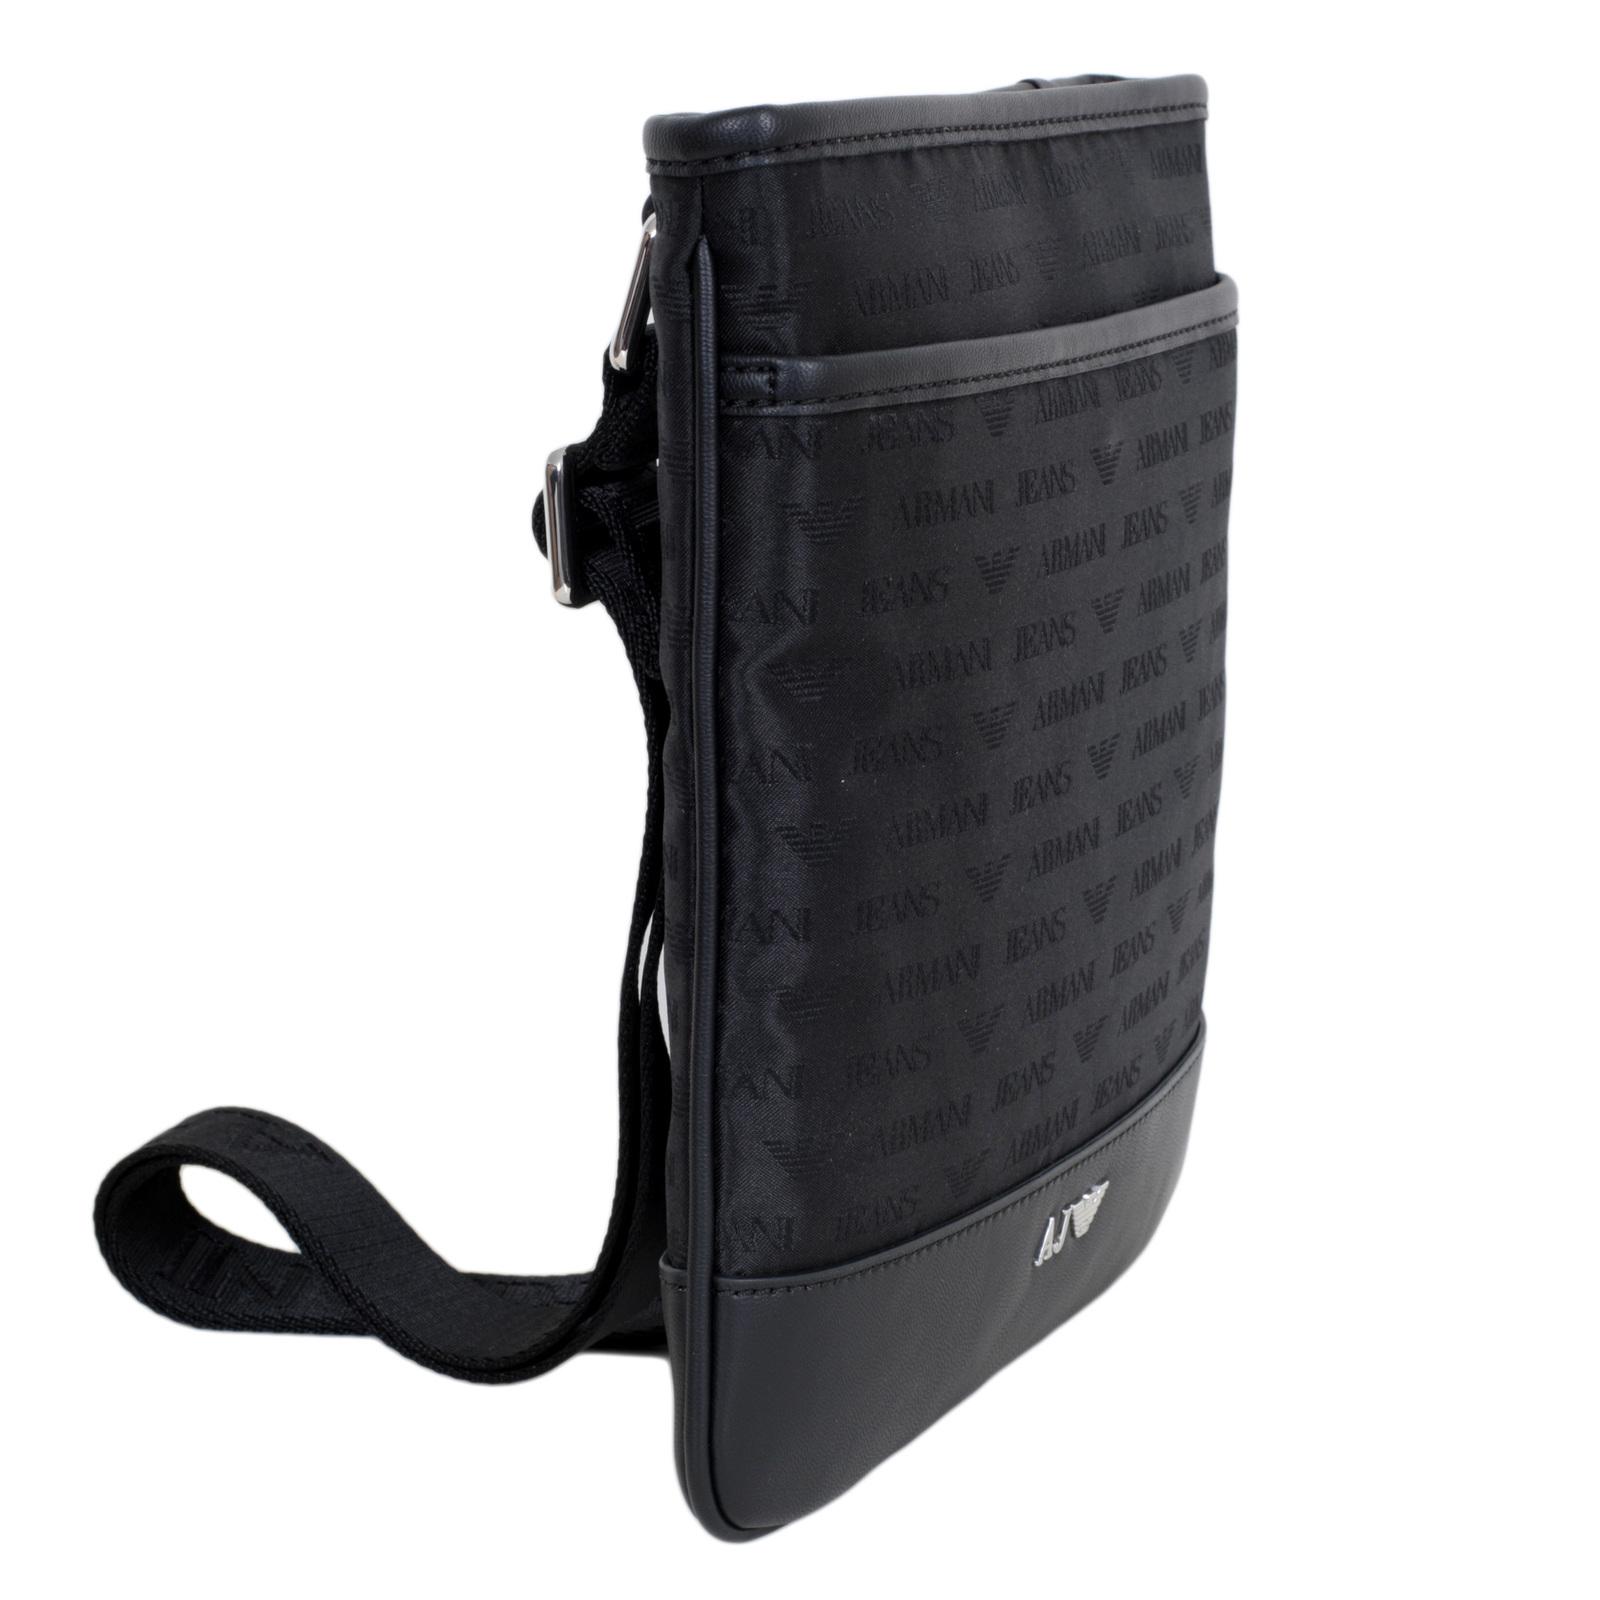 Armani Jeans Top Zip Closure Front Pocket Black Bag with Jacquard Monogram  and Eagle Logo AJM6476 9200c59d64ff1